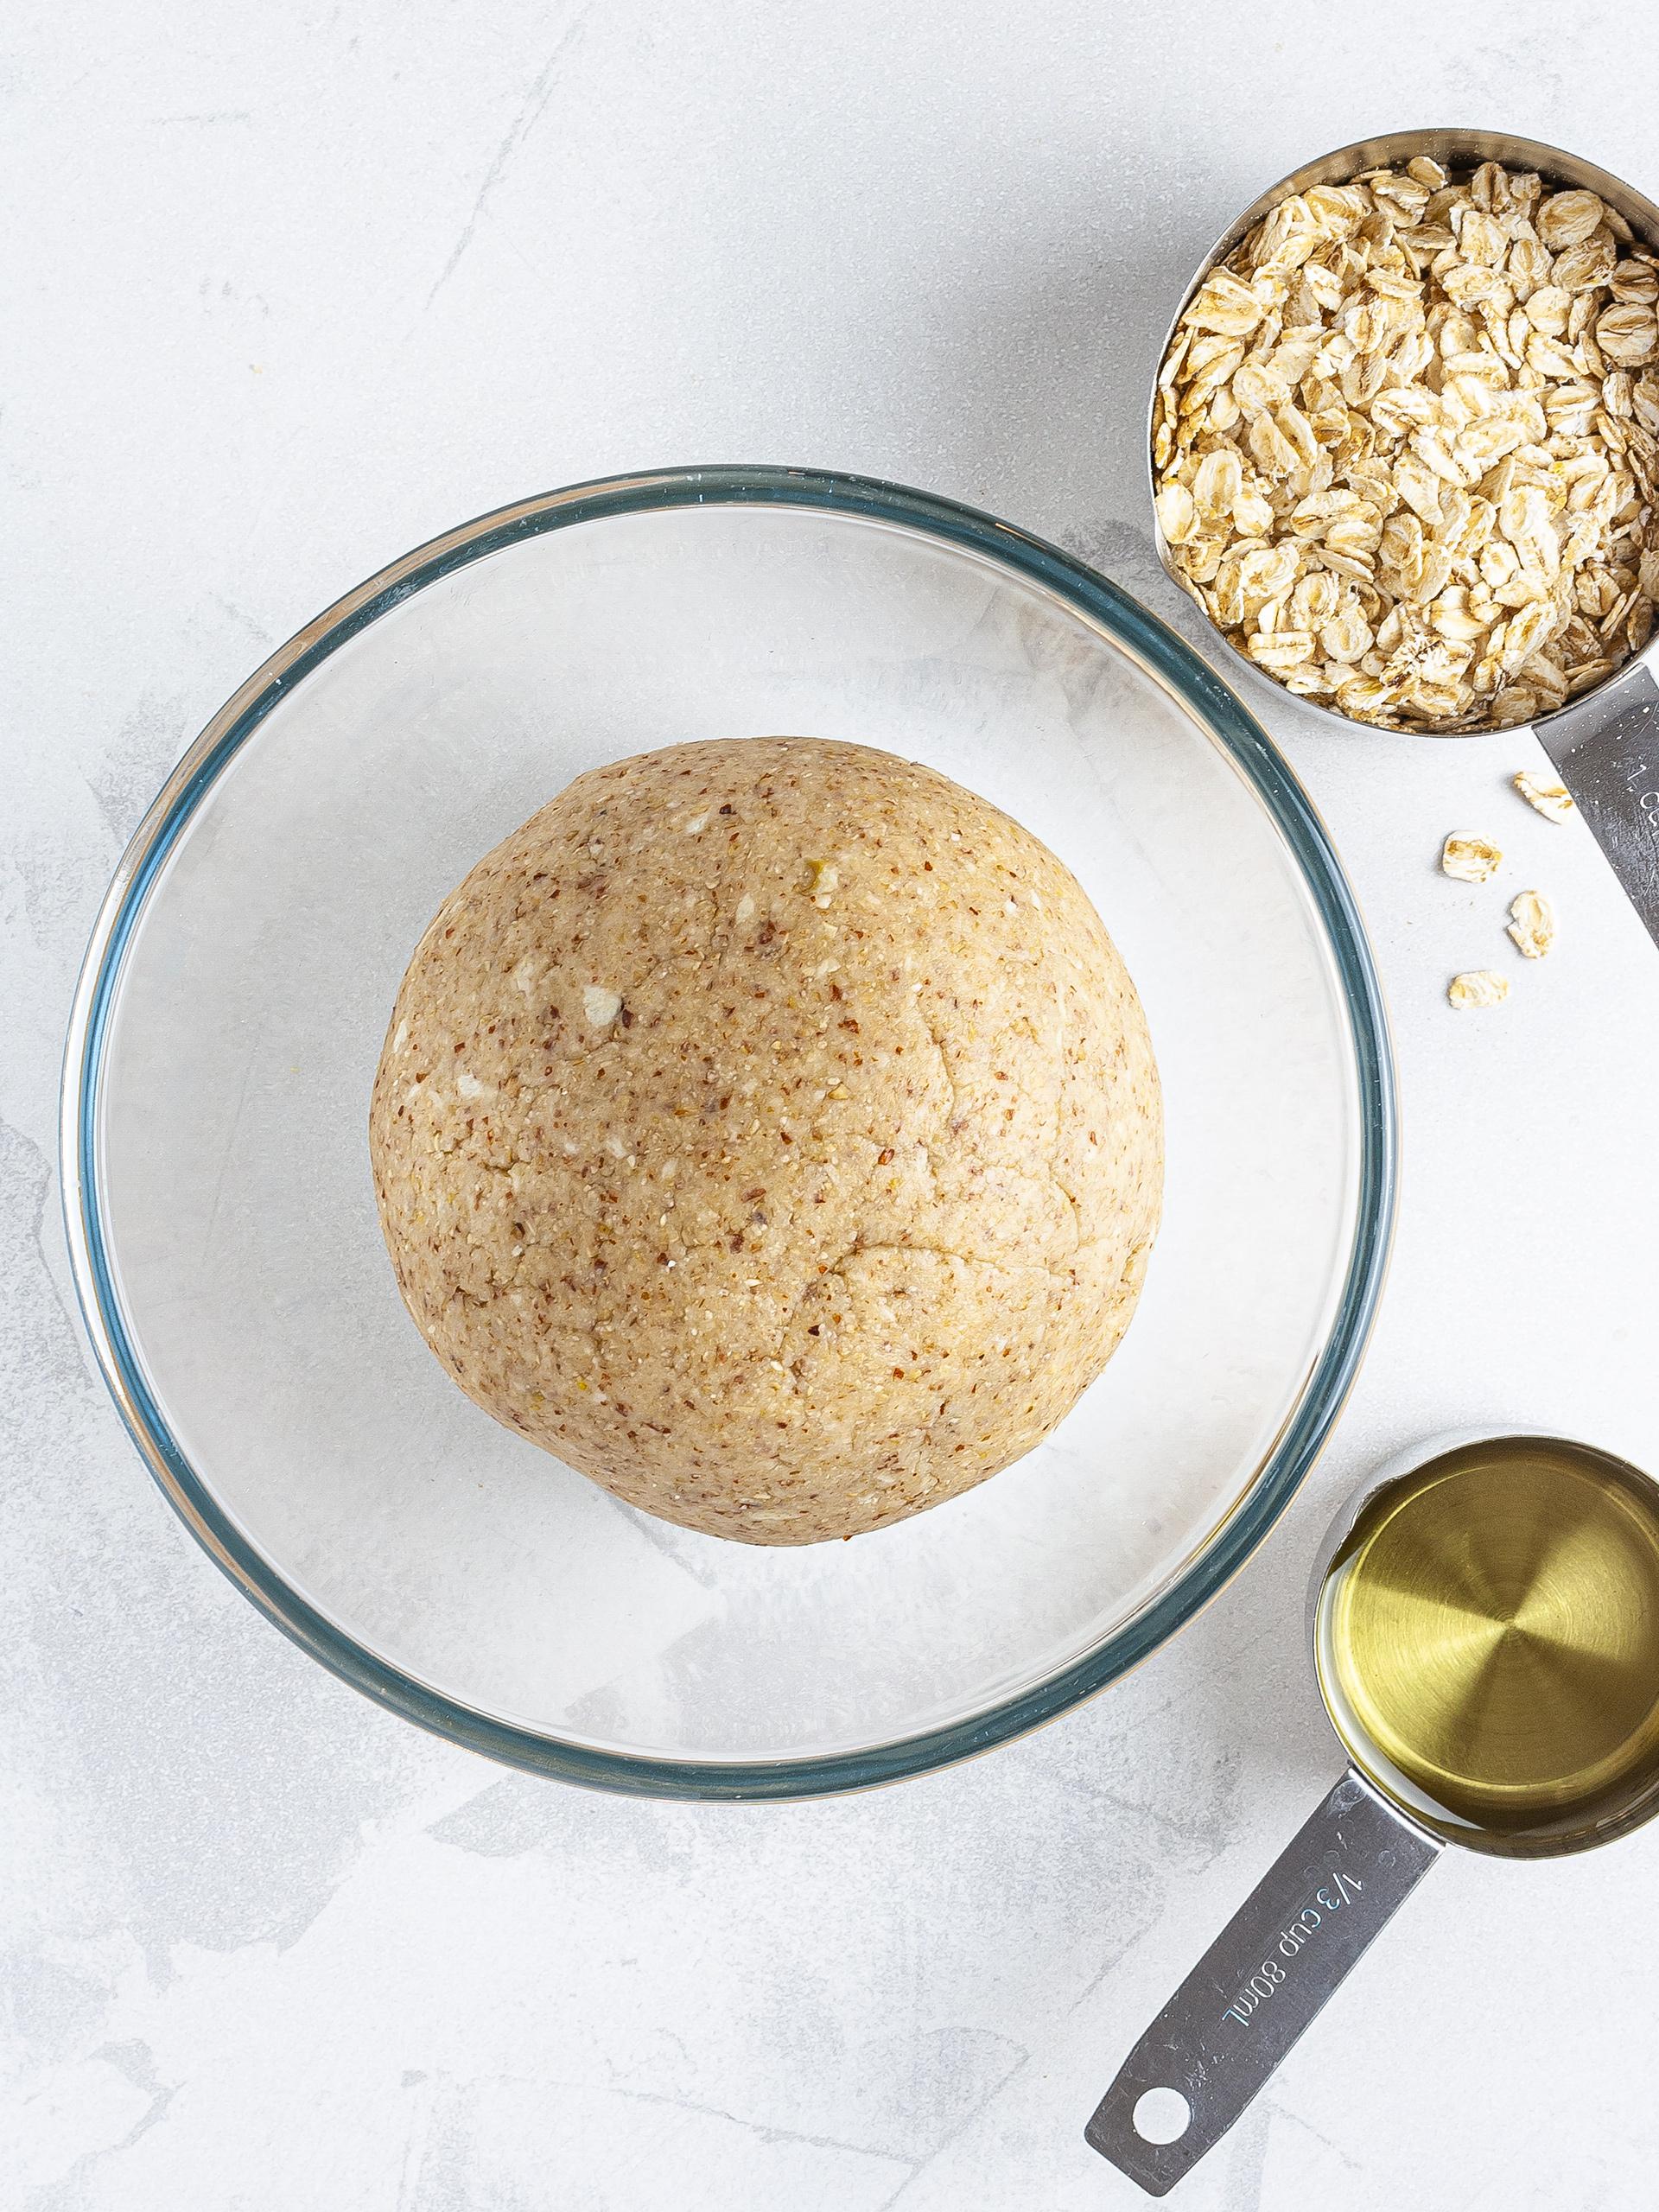 Gluten-free strudel dough in a bowl